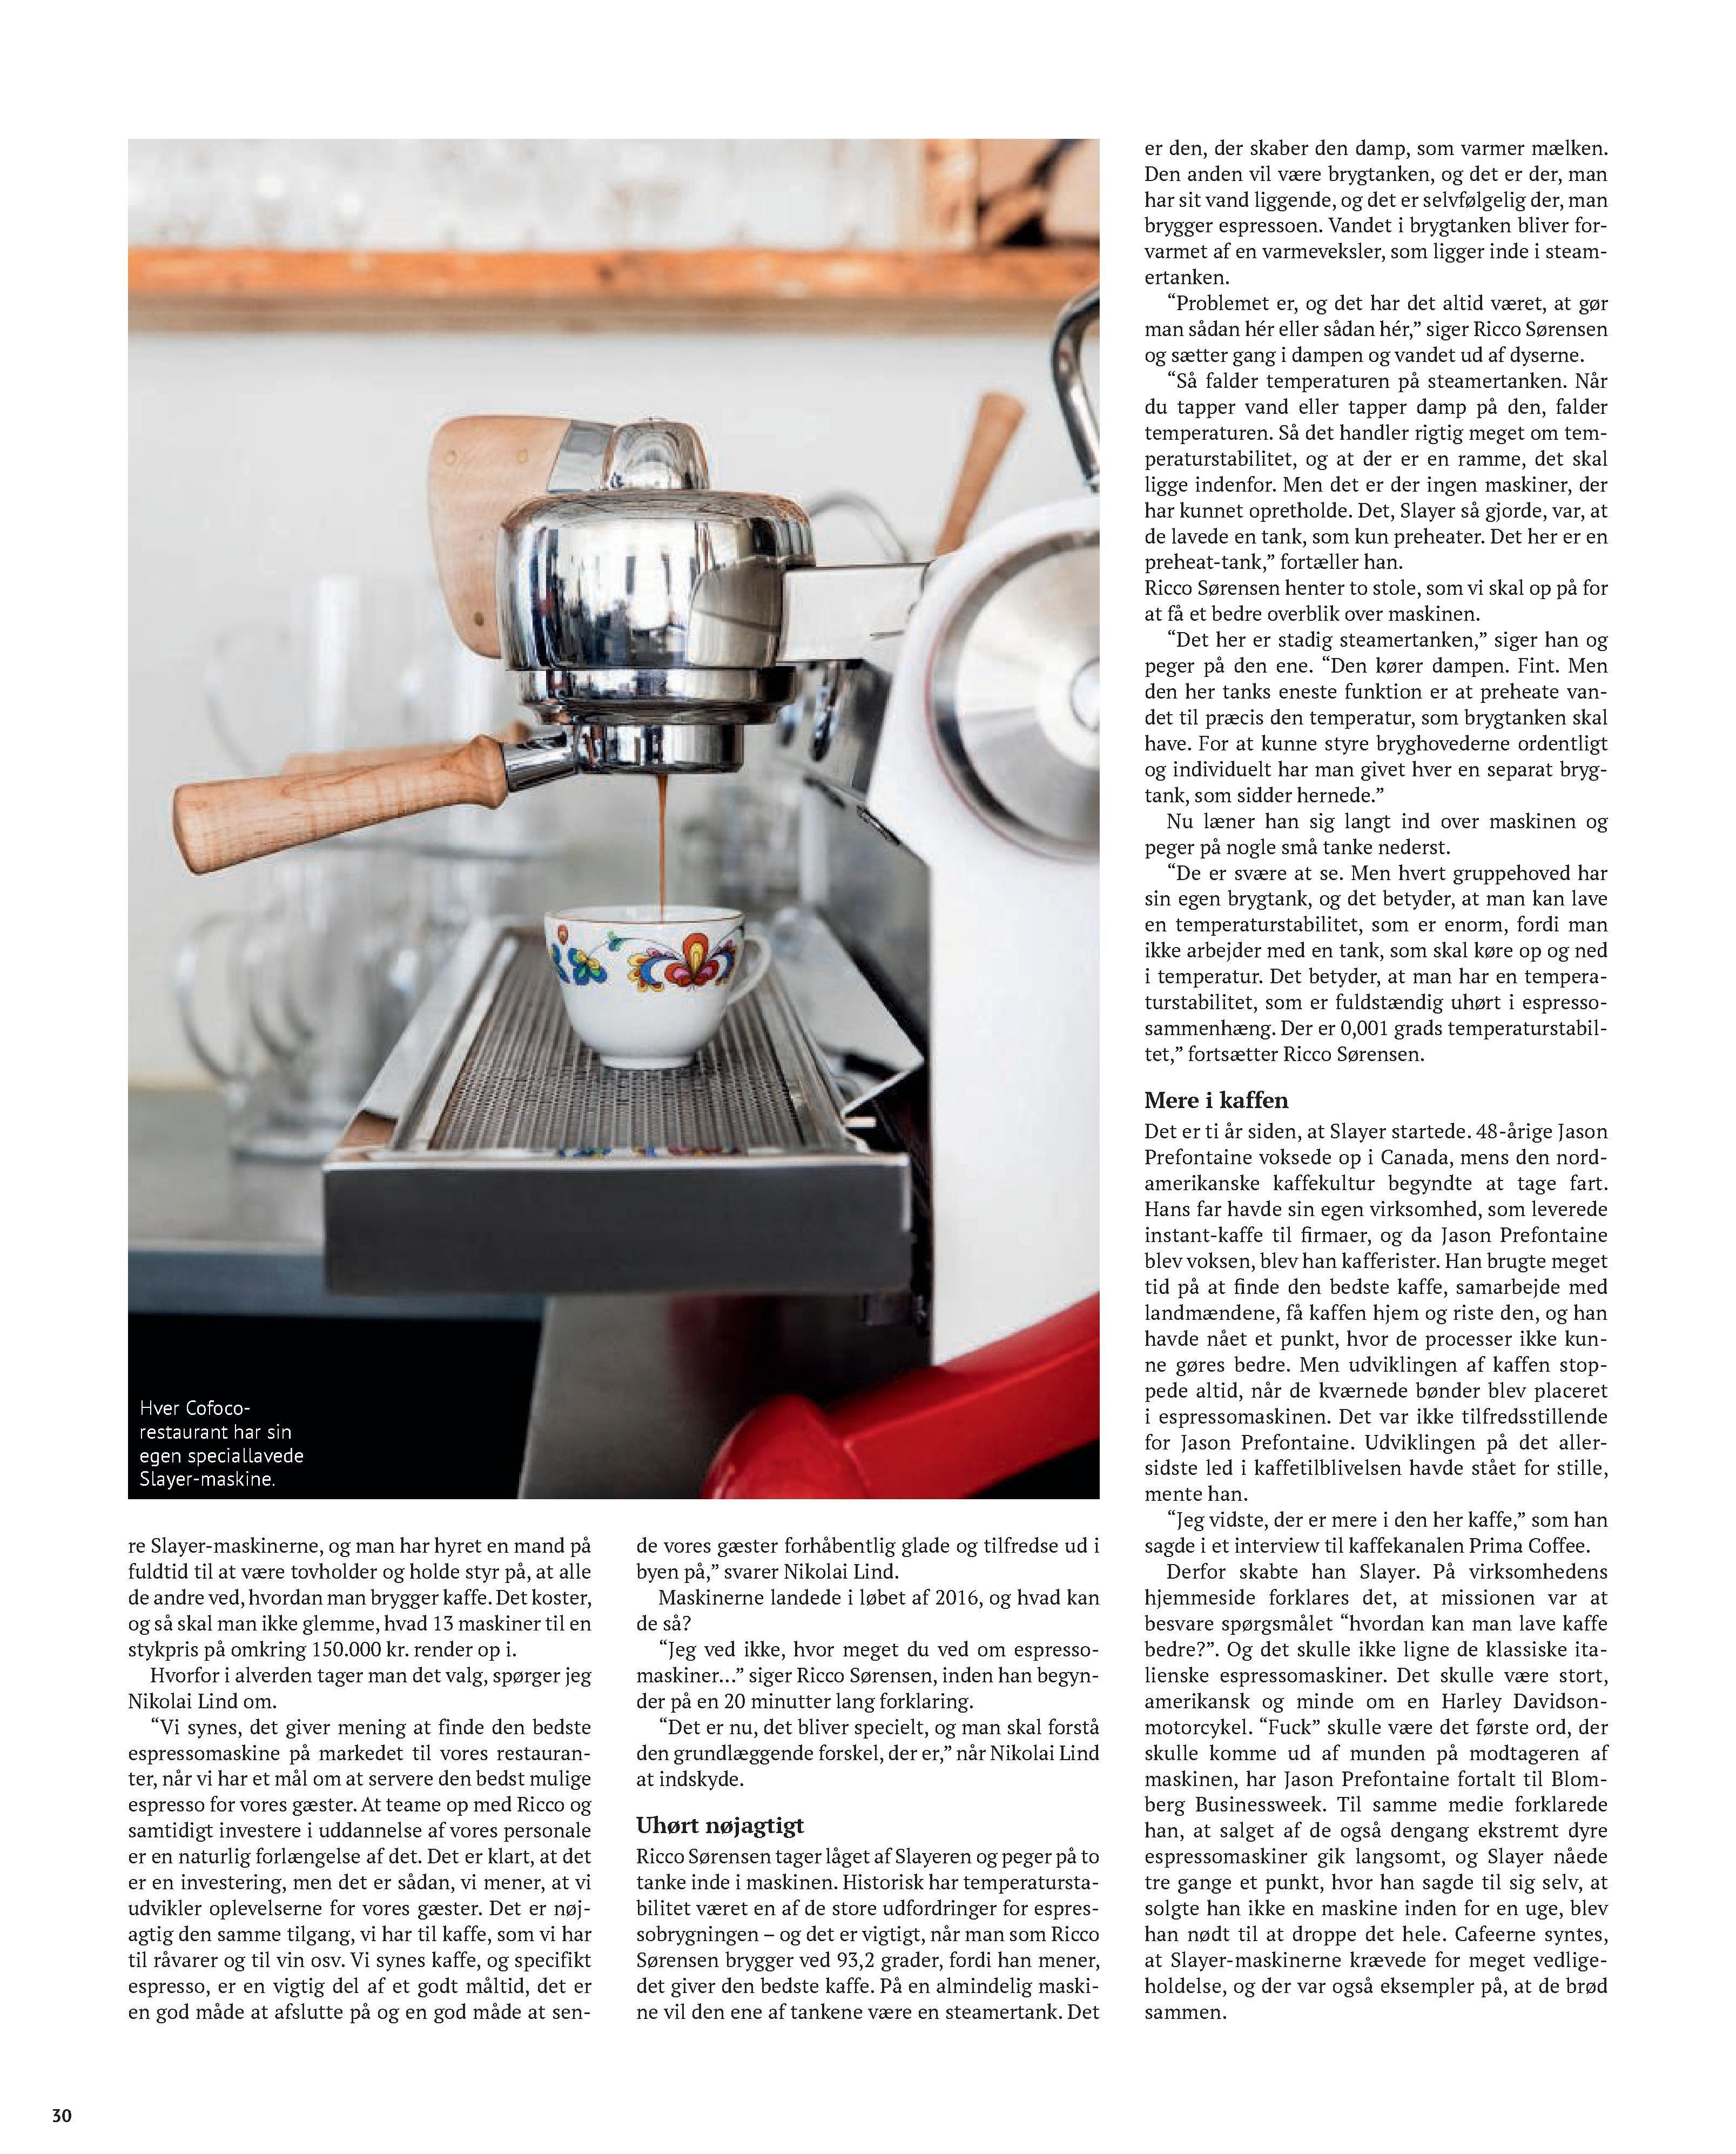 2017-04-20_Boersen_-_2017-04-20_printPLEASURE_slayer_kaffe.s3.jpg#asset:3782